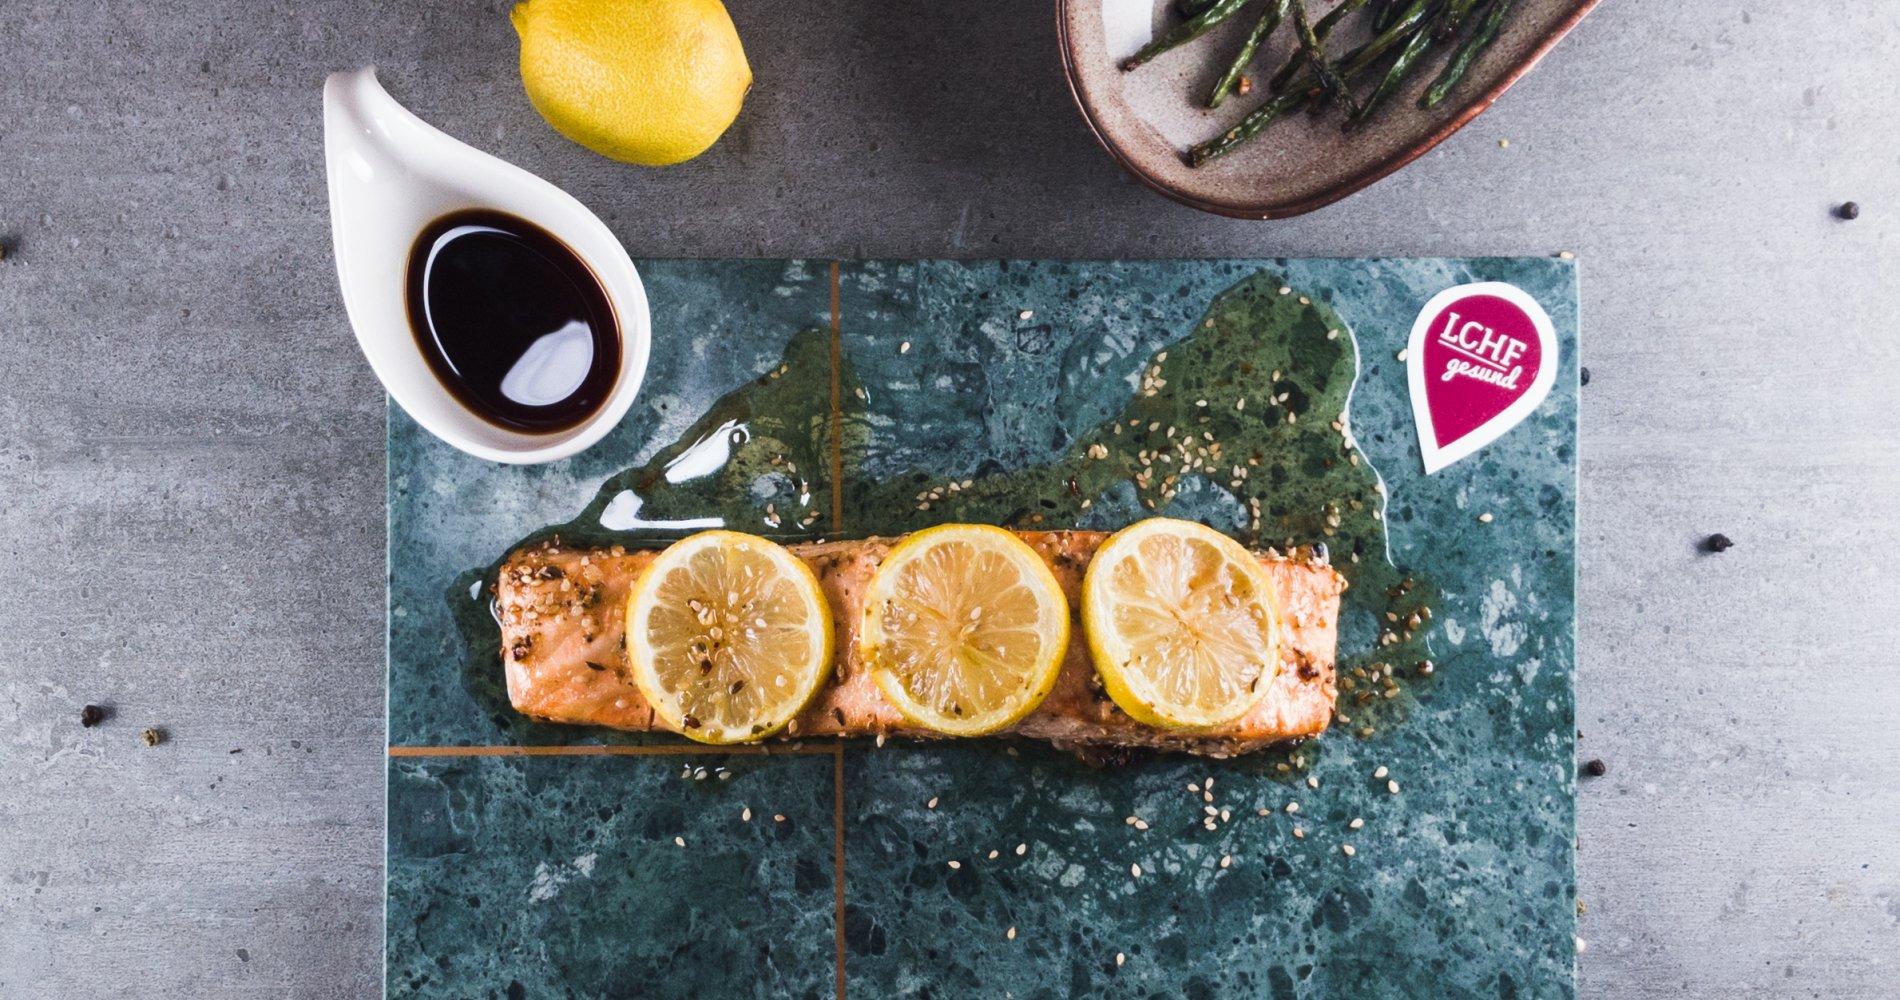 Rezept Low Carb: Zitroniges Lachsfilet aus dem Ofen - LCHF-gesund.de